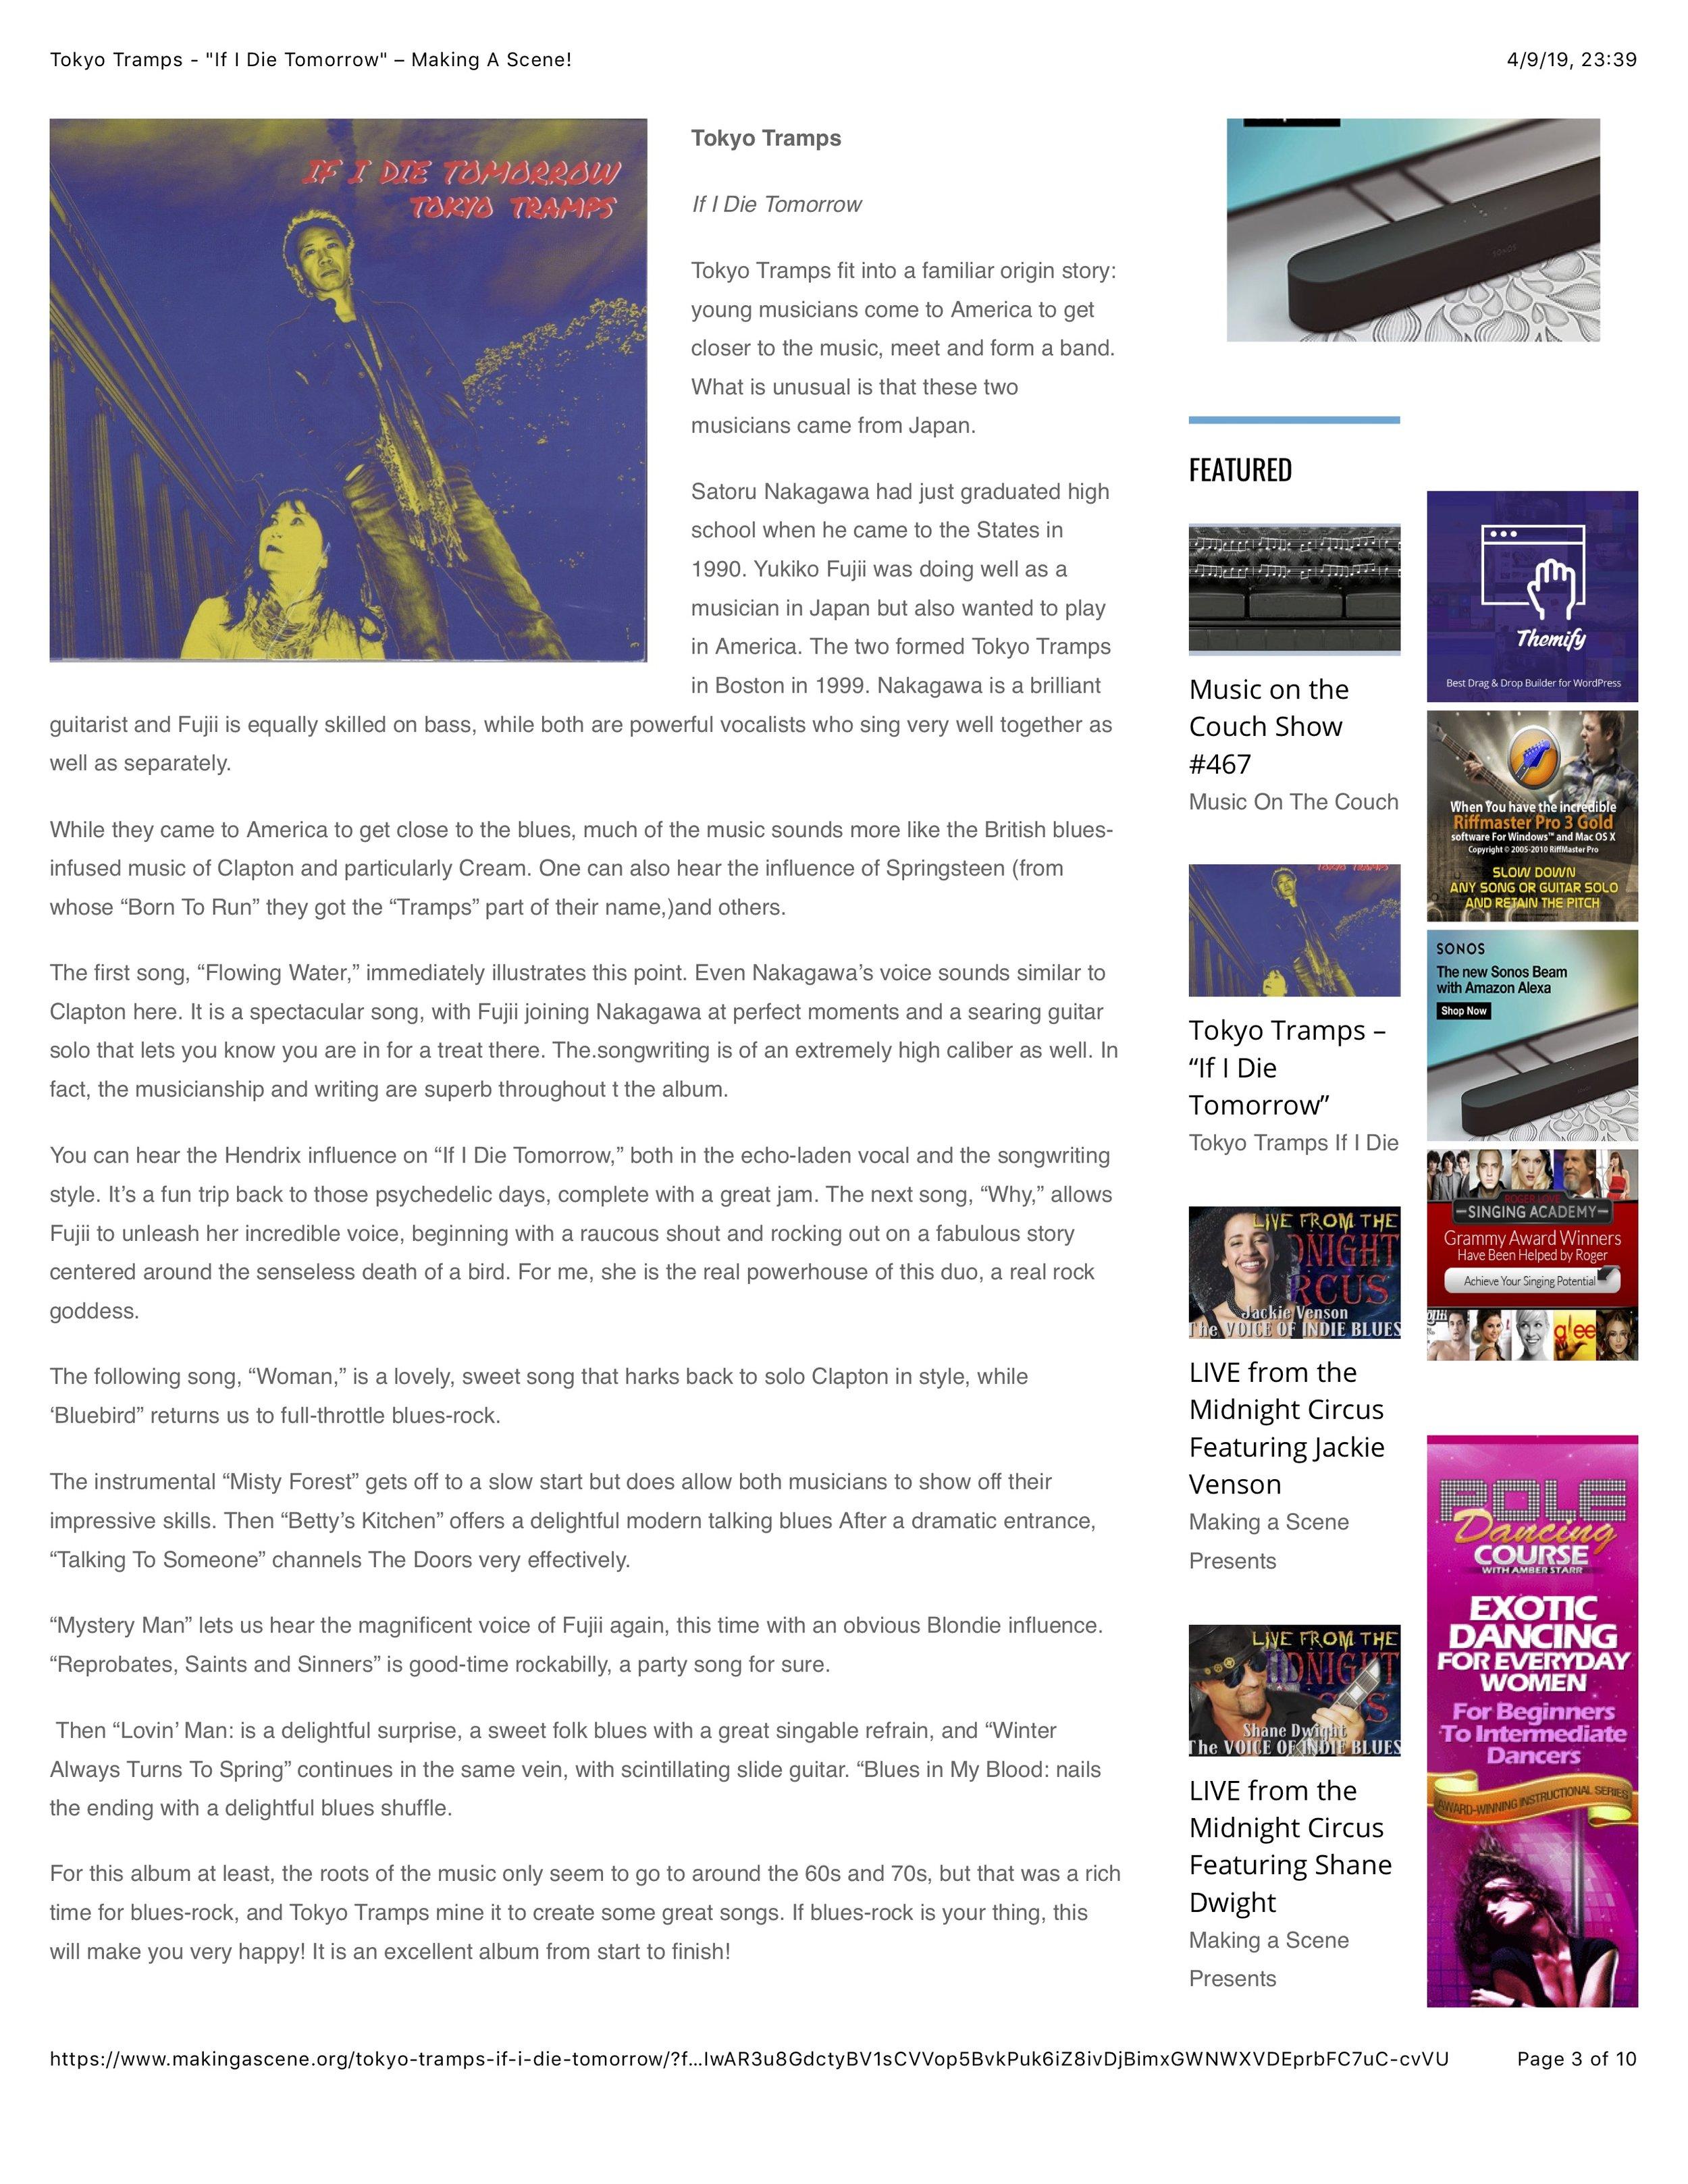 Music Reviews — TOKYO TRAMPS